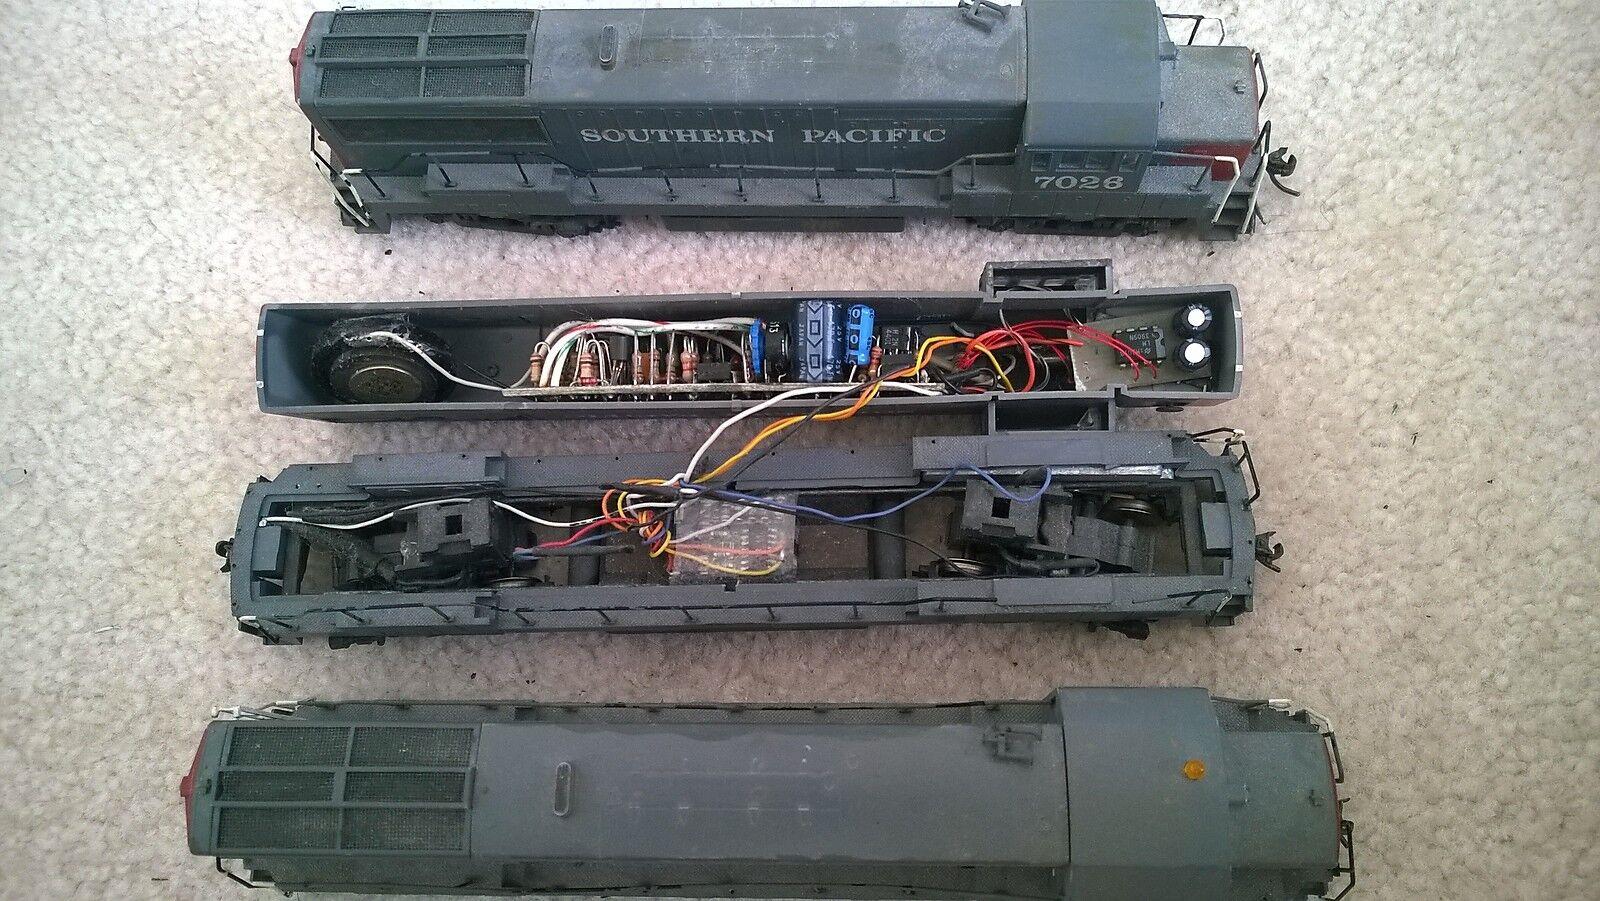 3 DCC DCC DCC equip U28B  with suono unit  2 energiaosso, 1 dummy  (EA0-E020) 9267da